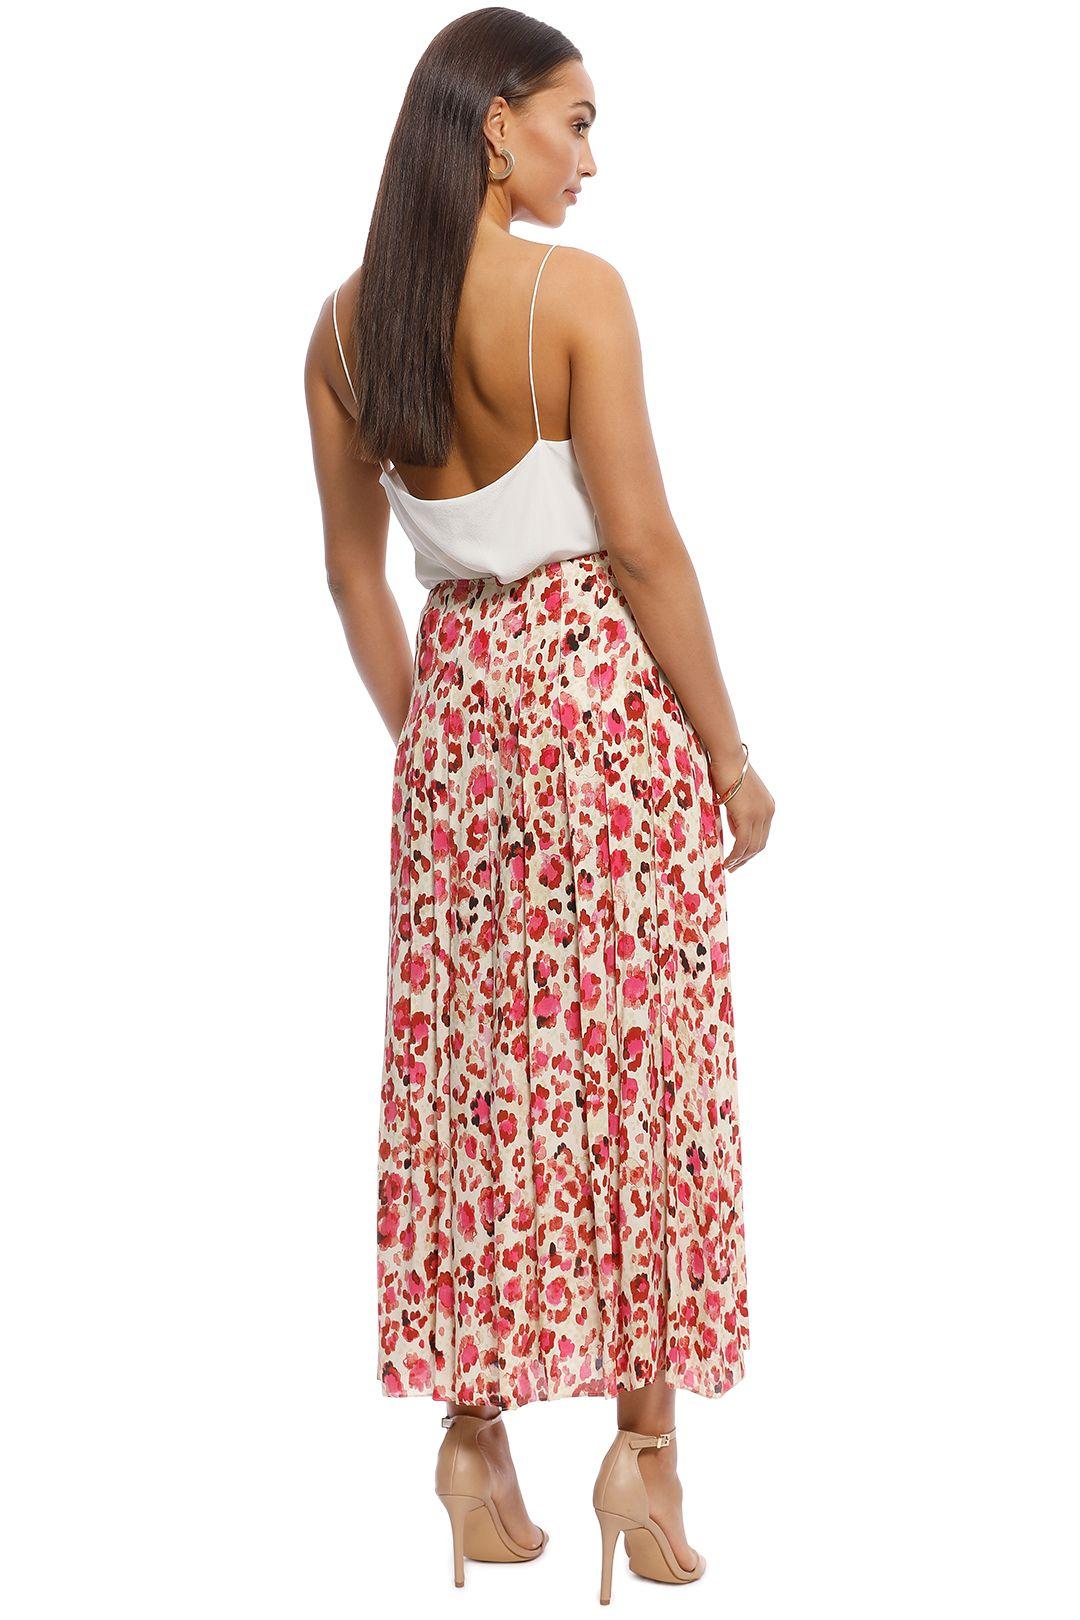 MNG - Elea Printed Midi Skirt - Pink - Back